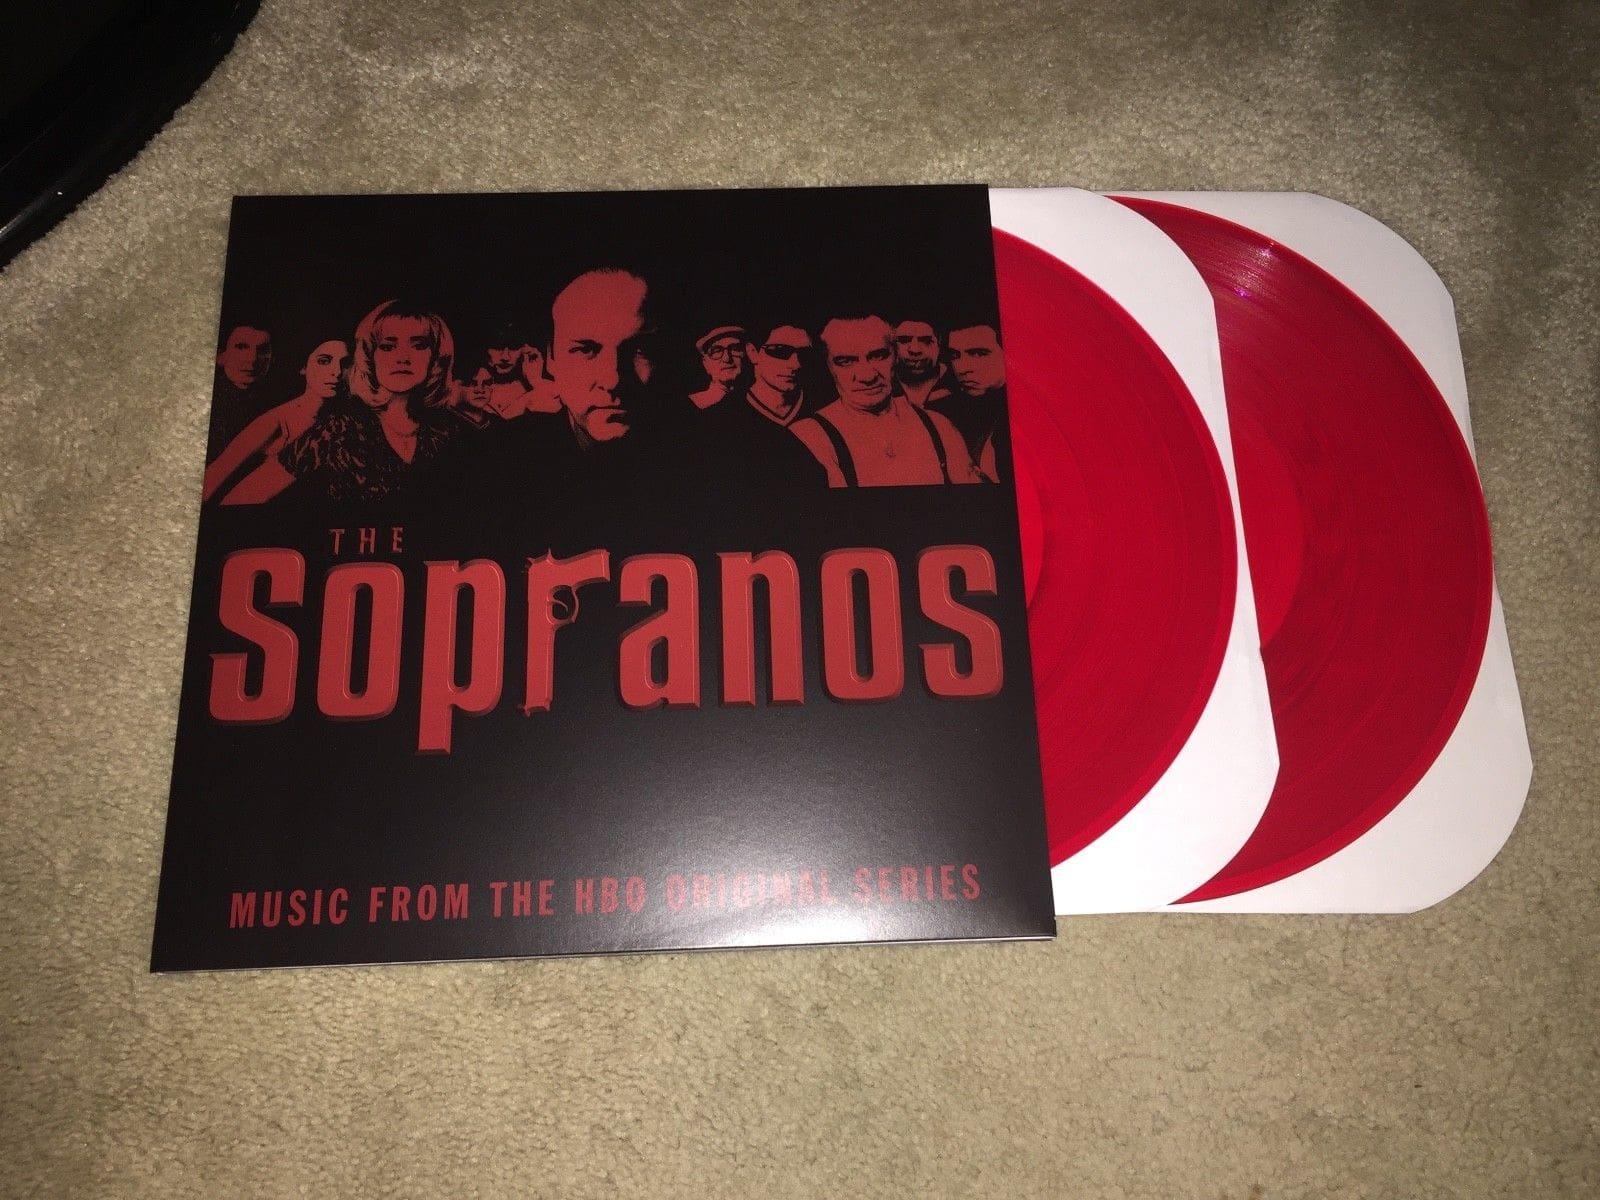 5098 - Eurythmics - (On a soundtrack) - The Sopranos - USA - LP - SRC074